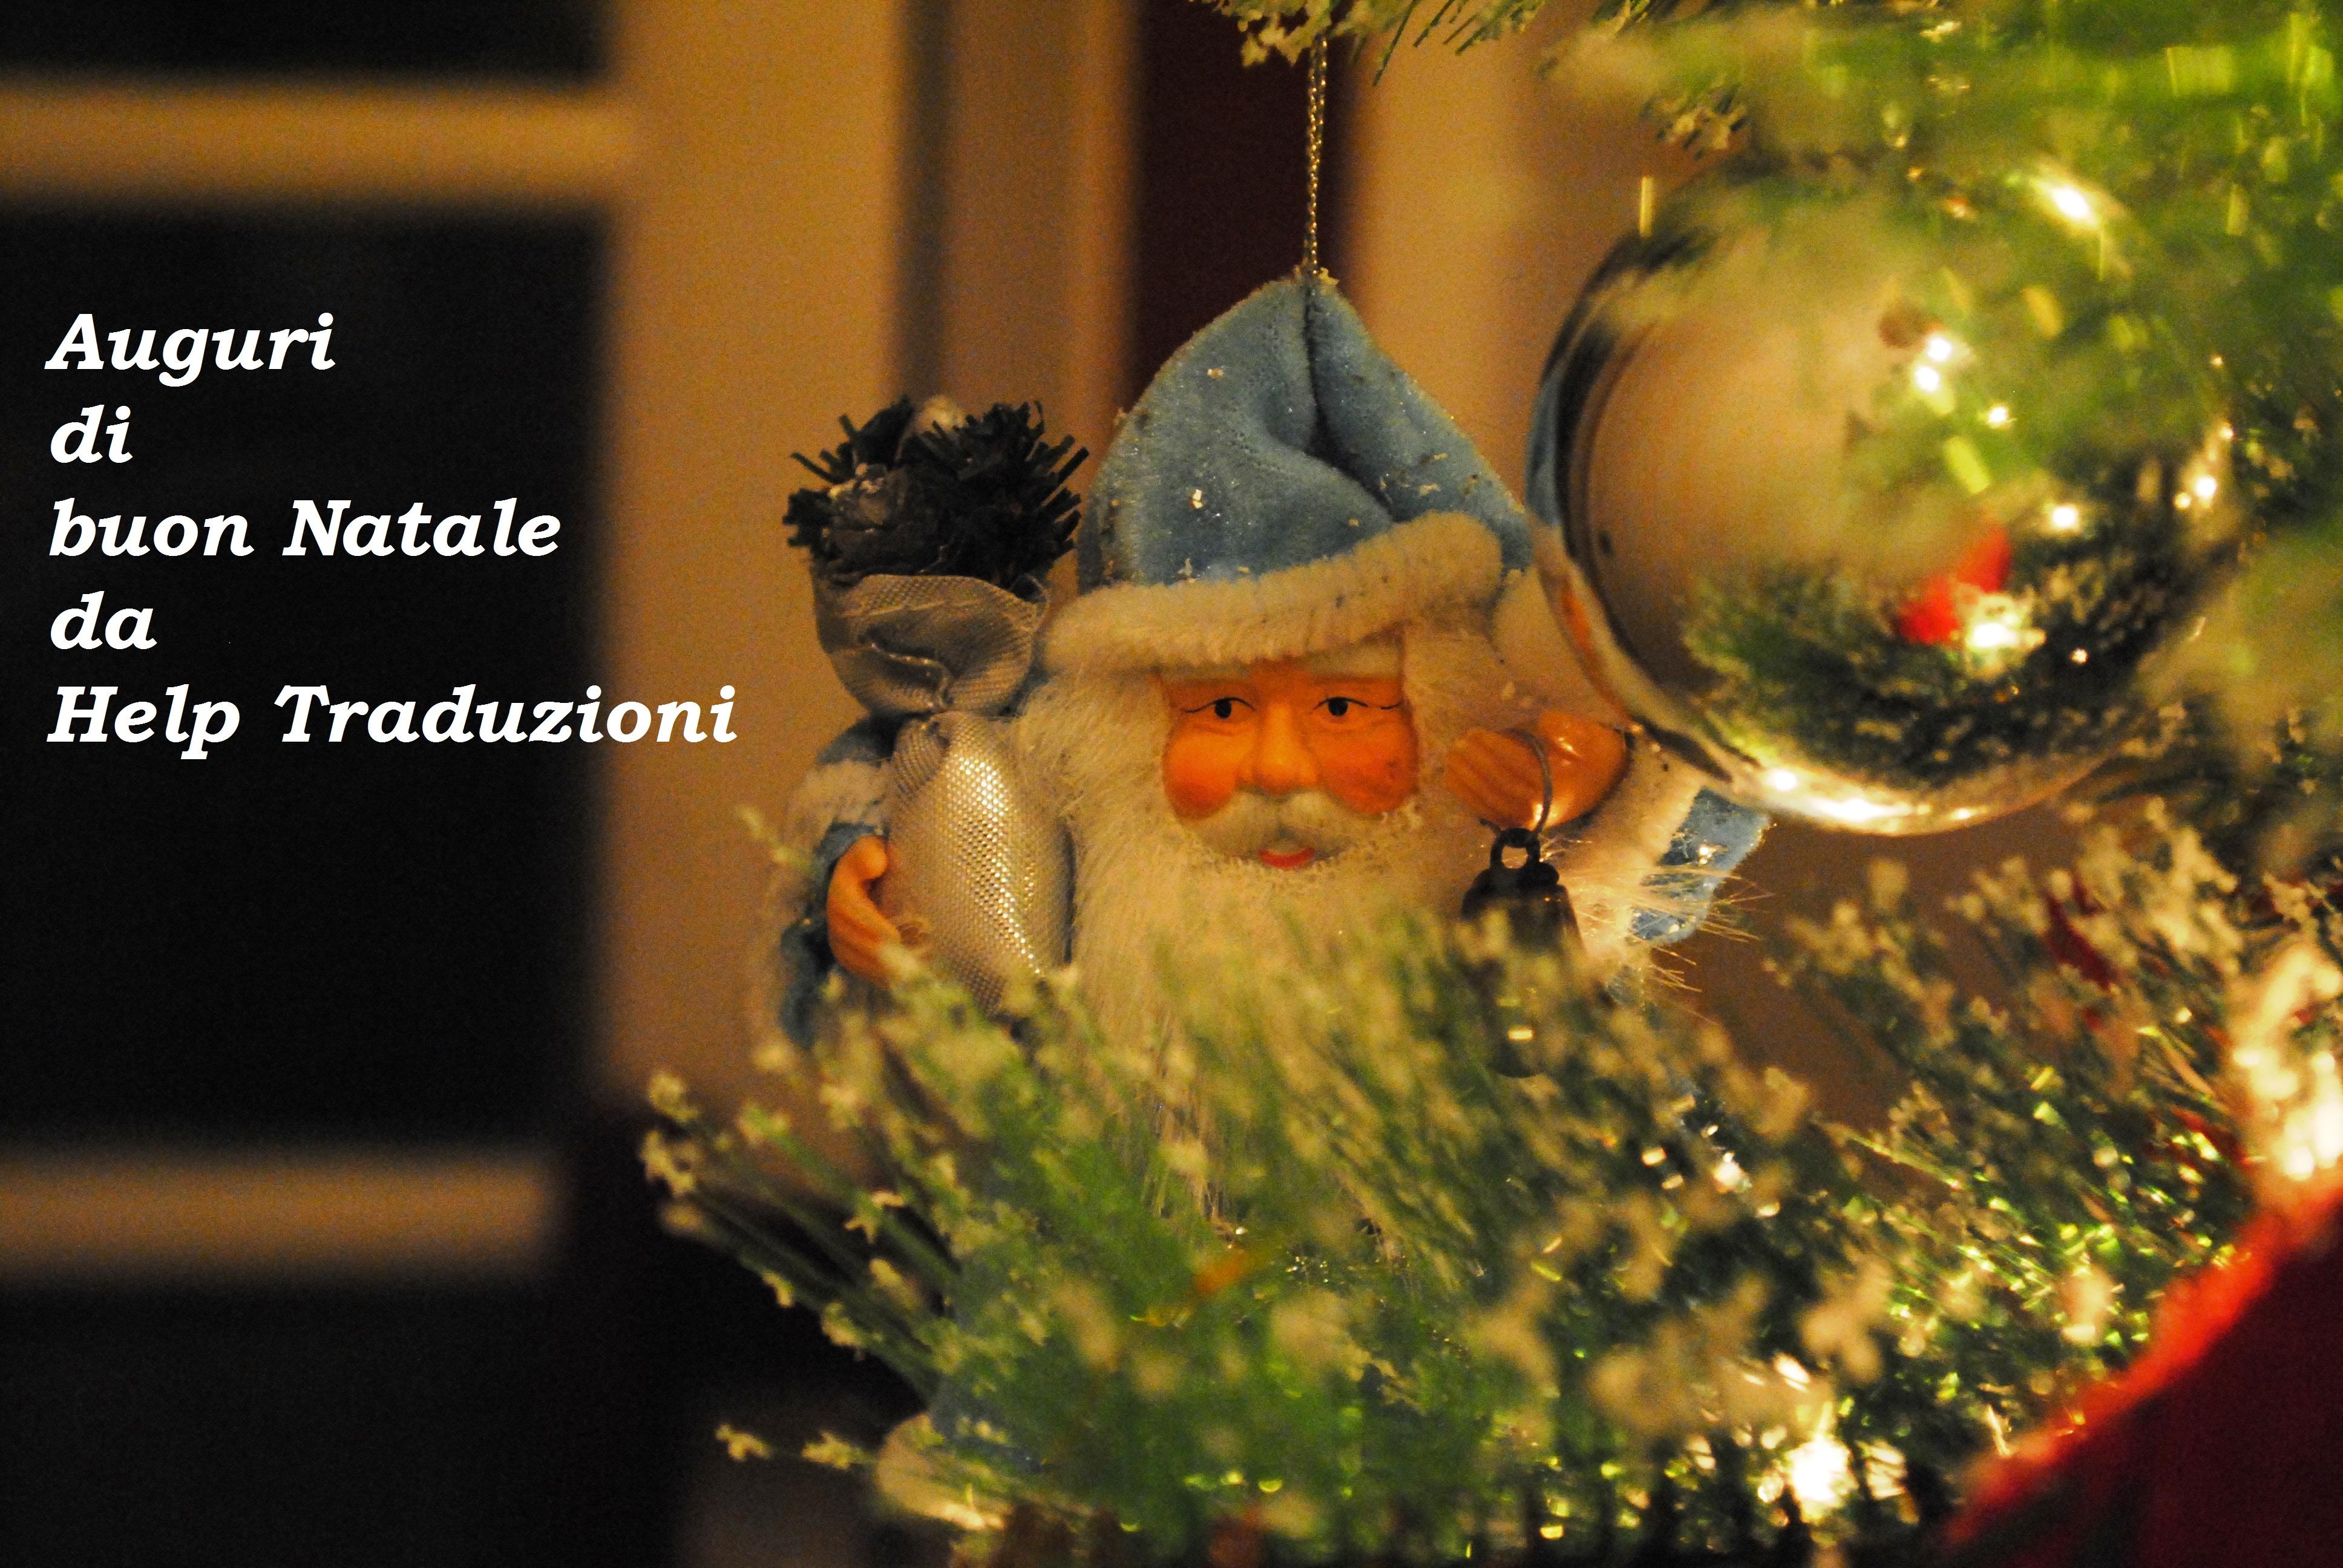 Regali Di Natale Traduzione Inglese.Strenna Natalizia Traduzione Disegni Di Natale 2019